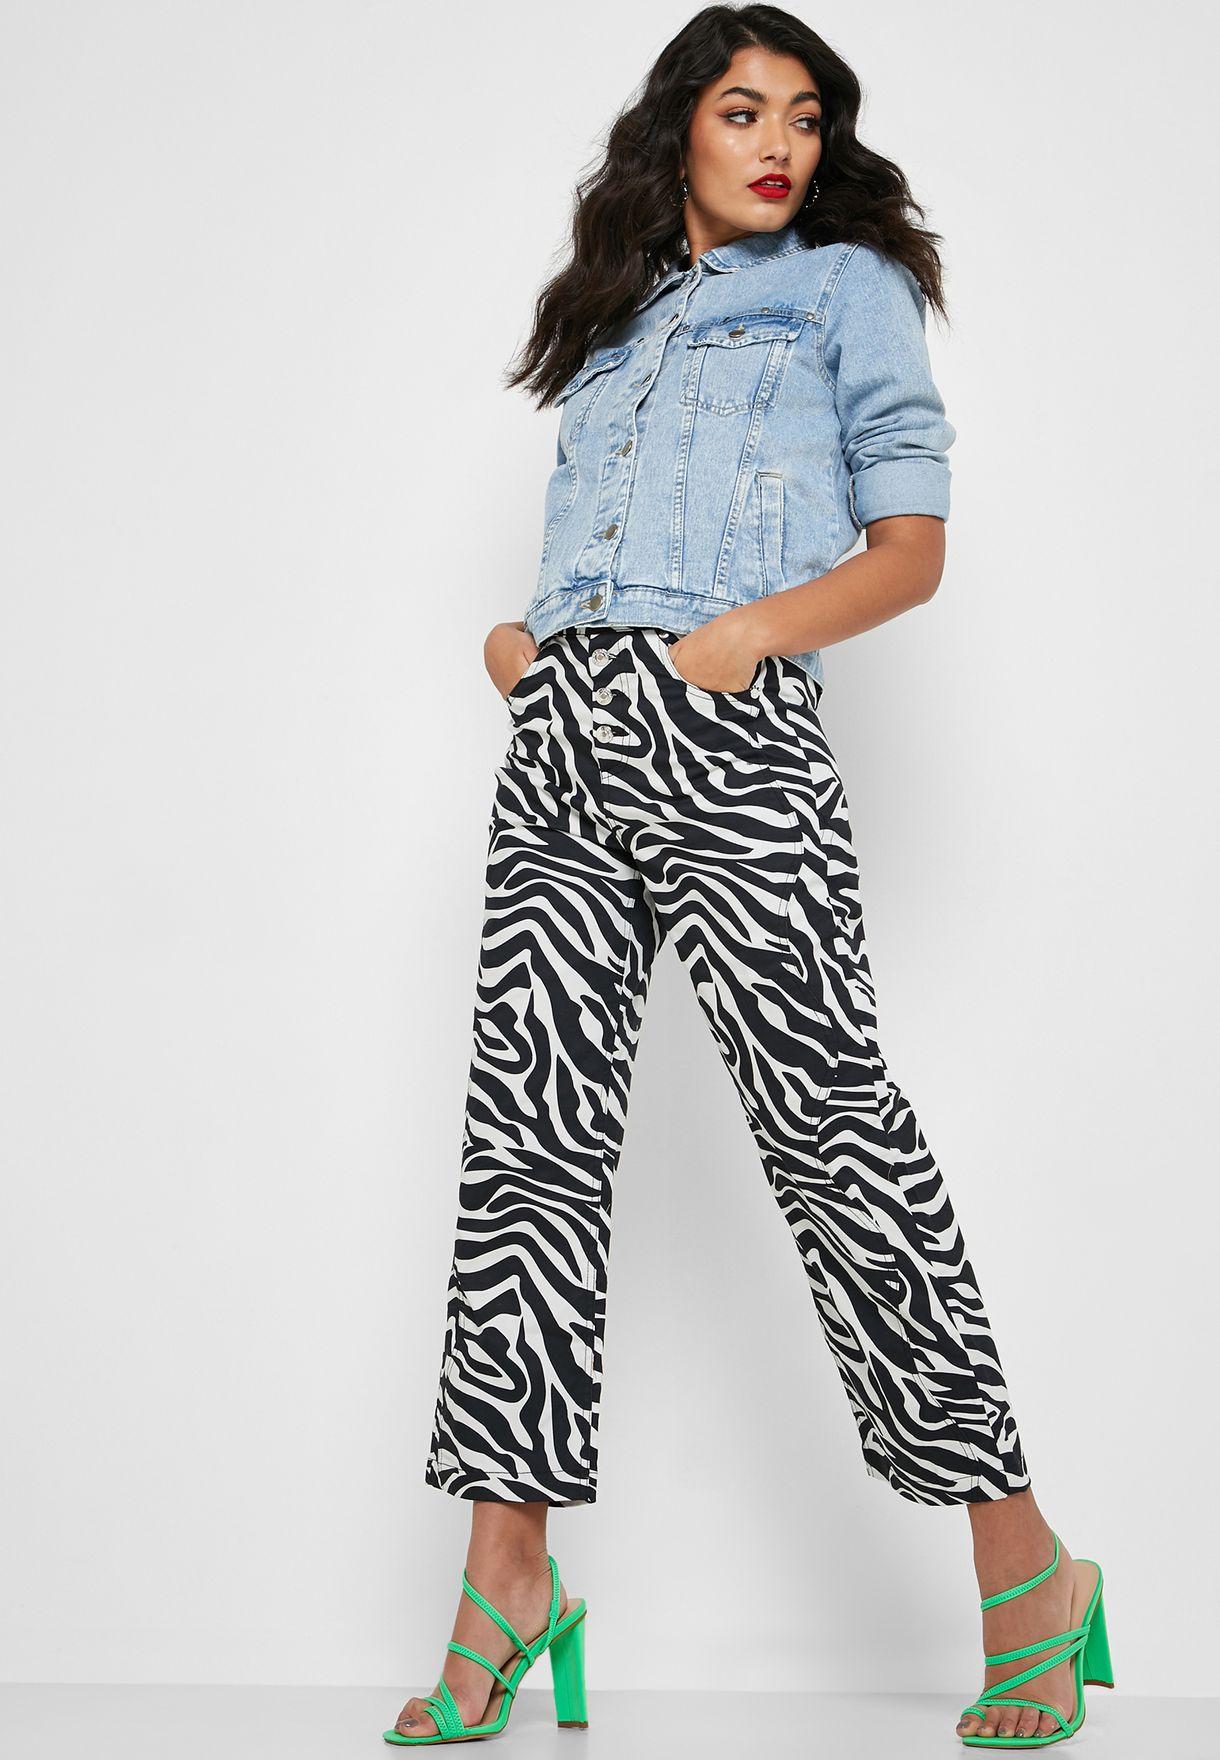 Wide Leg Zebra Print Jeans